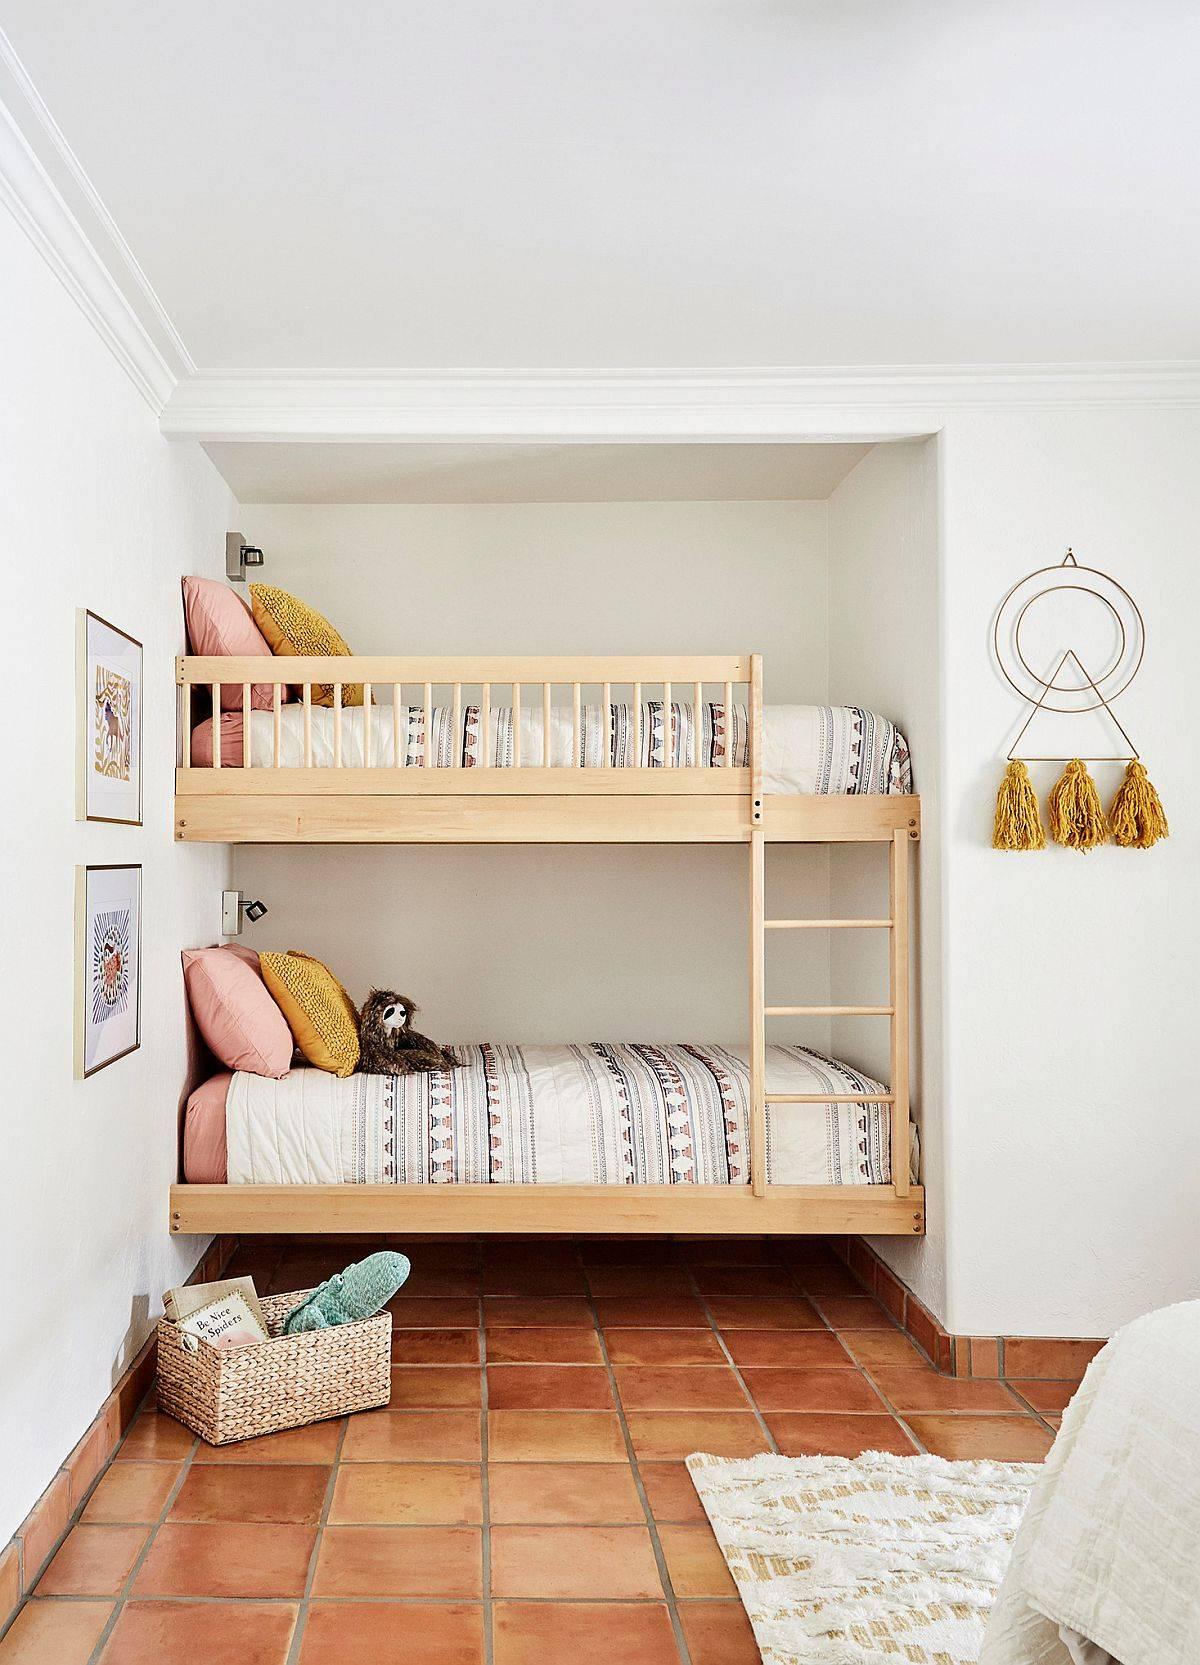 Lovely-kids-bedroom-with-bunk-beds-in-the-corner-and-terracotta-floor-tiles-20228